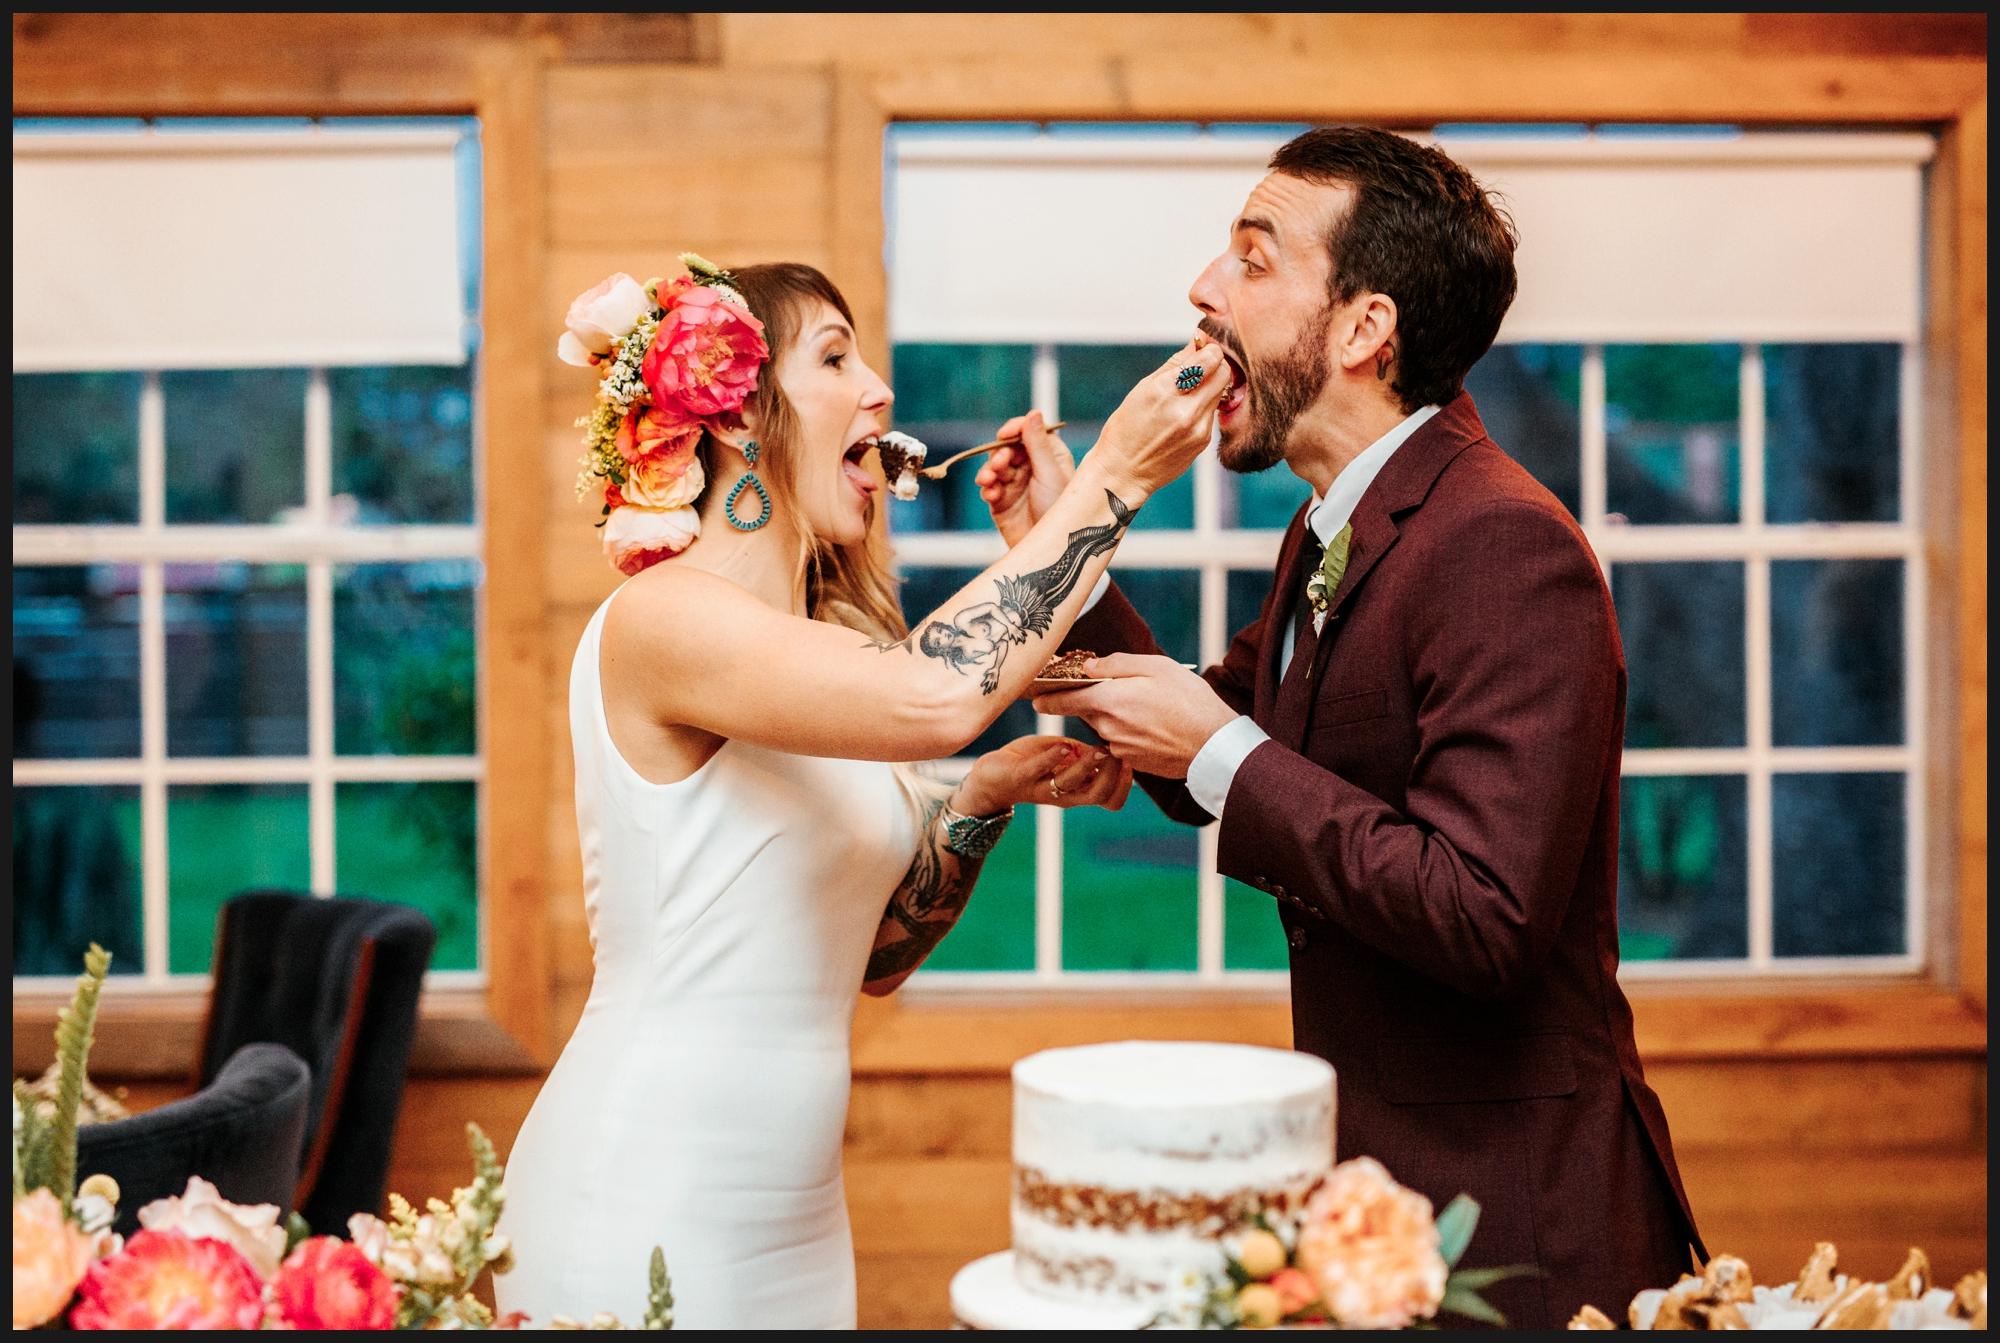 Orlando-Wedding-Photographer-destination-wedding-photographer-florida-wedding-photographer-bohemian-wedding-photographer_2042.jpg